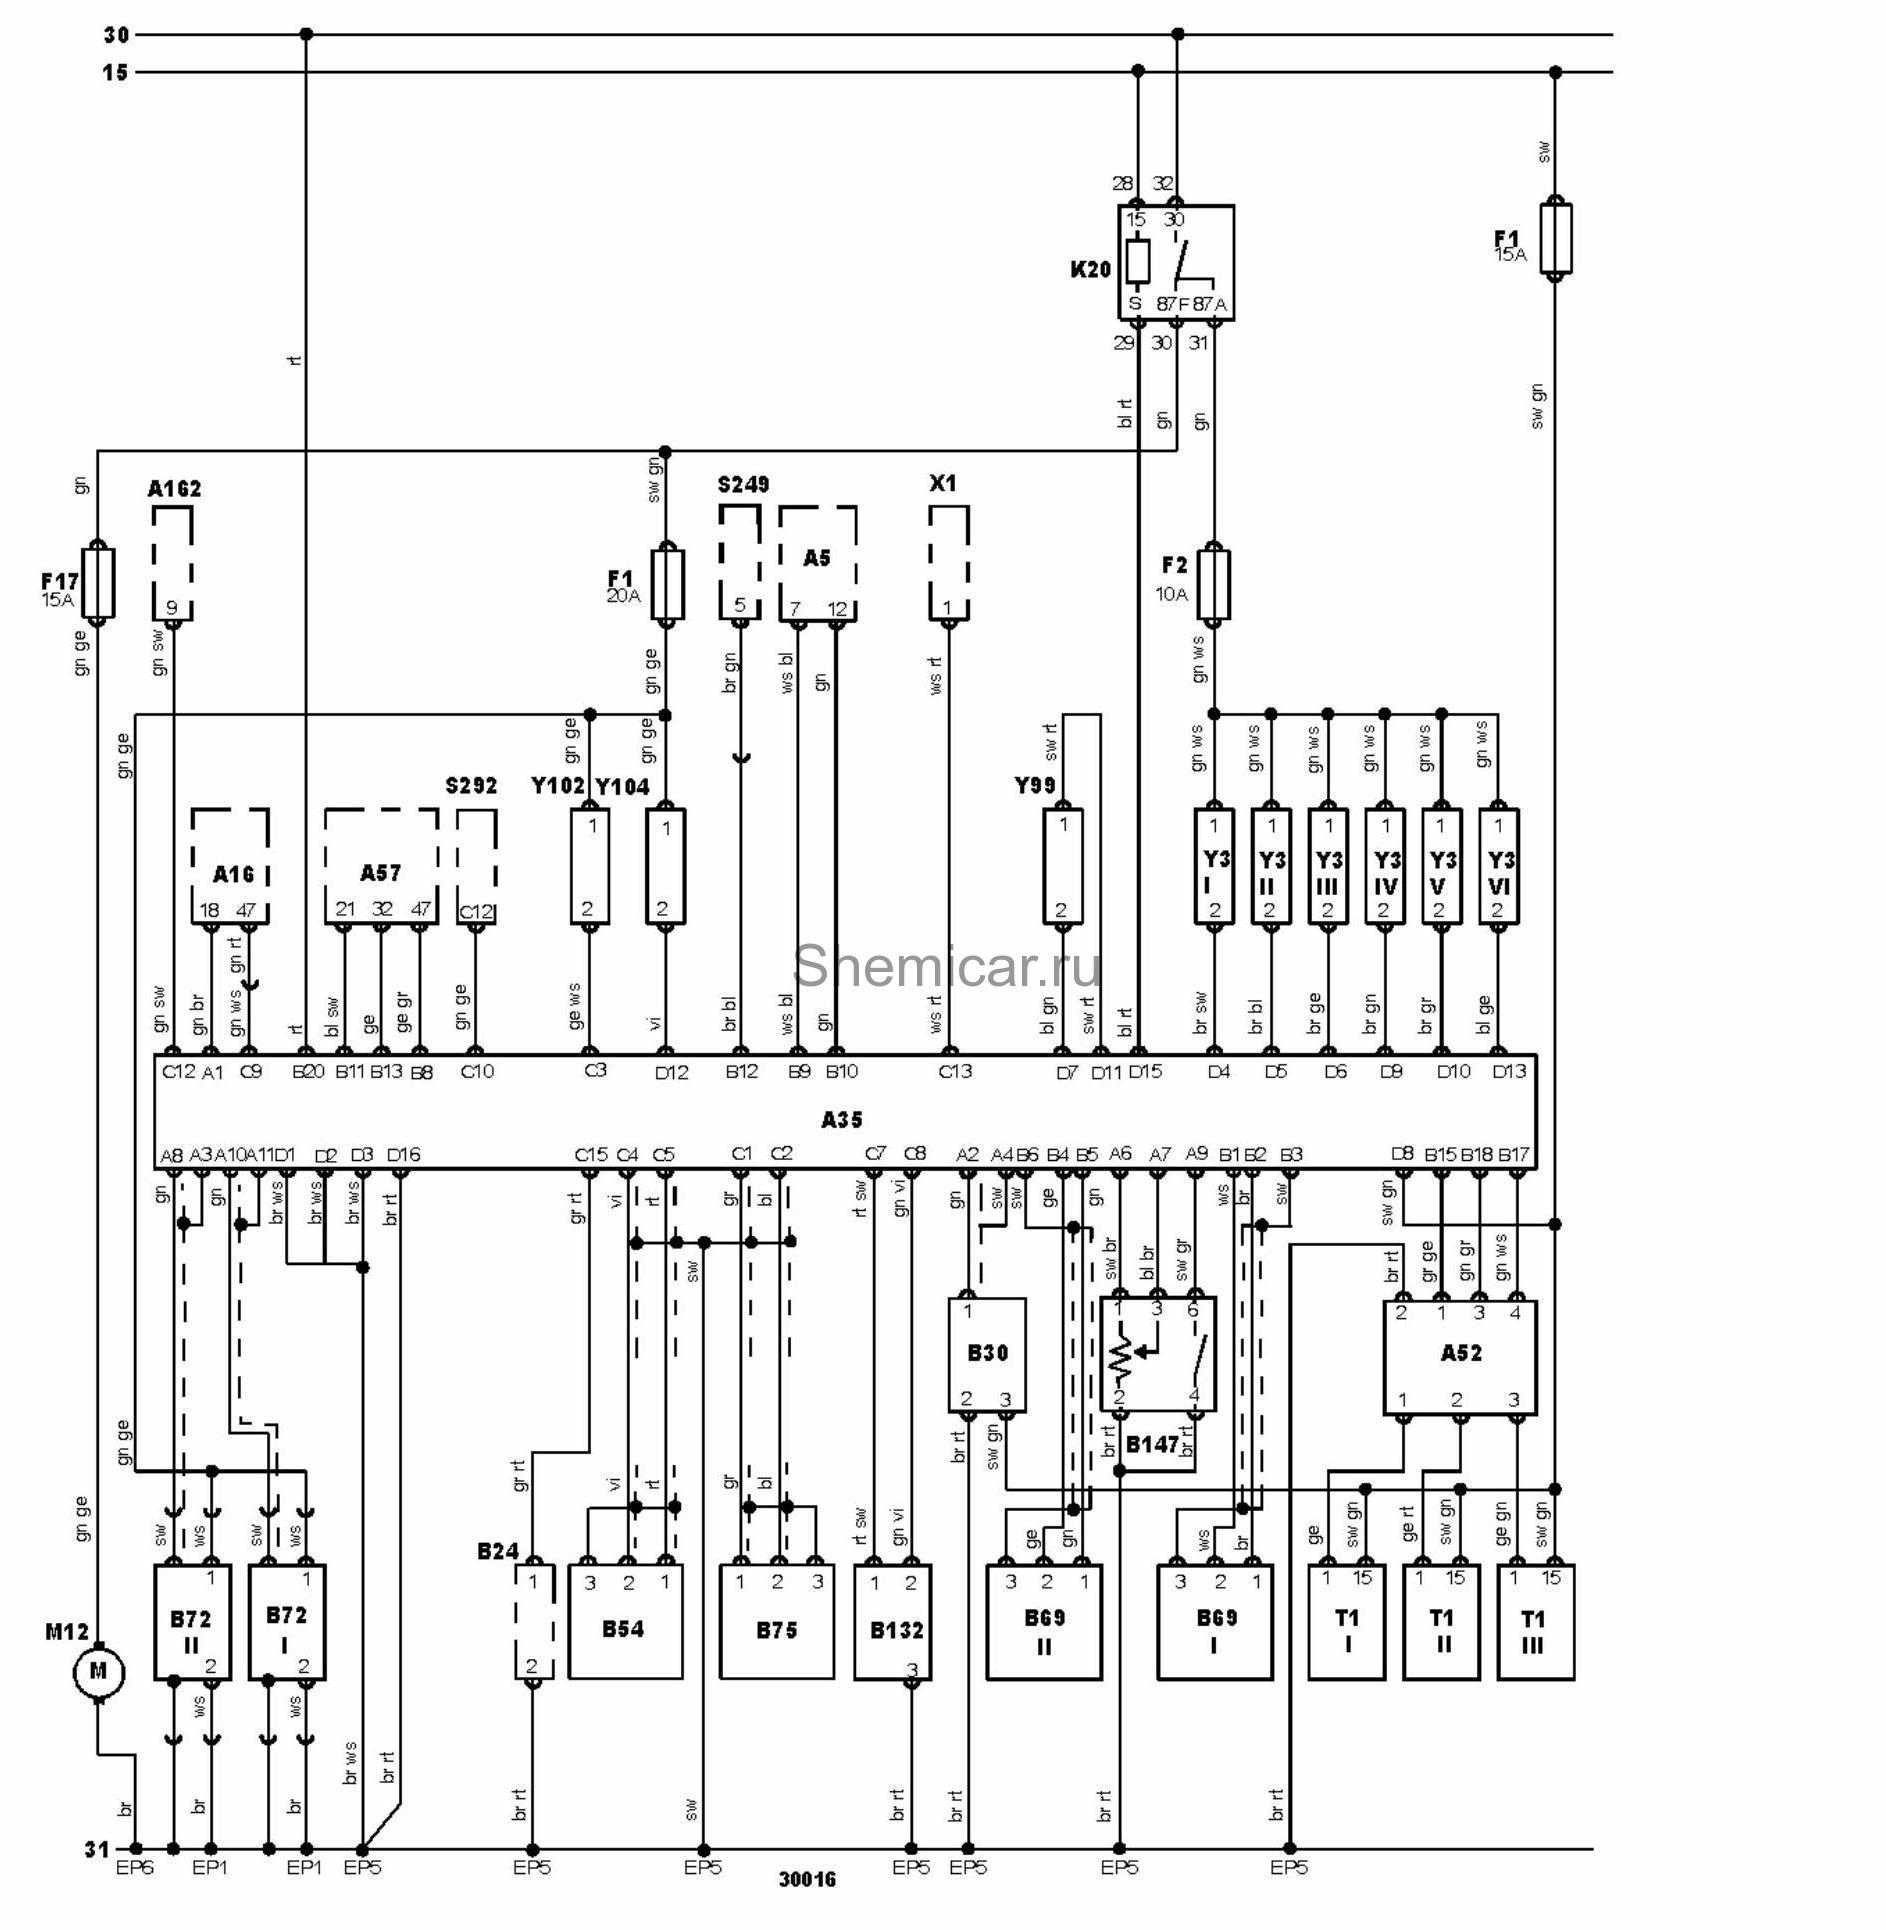 Audi 80 схема двигателя фото 34